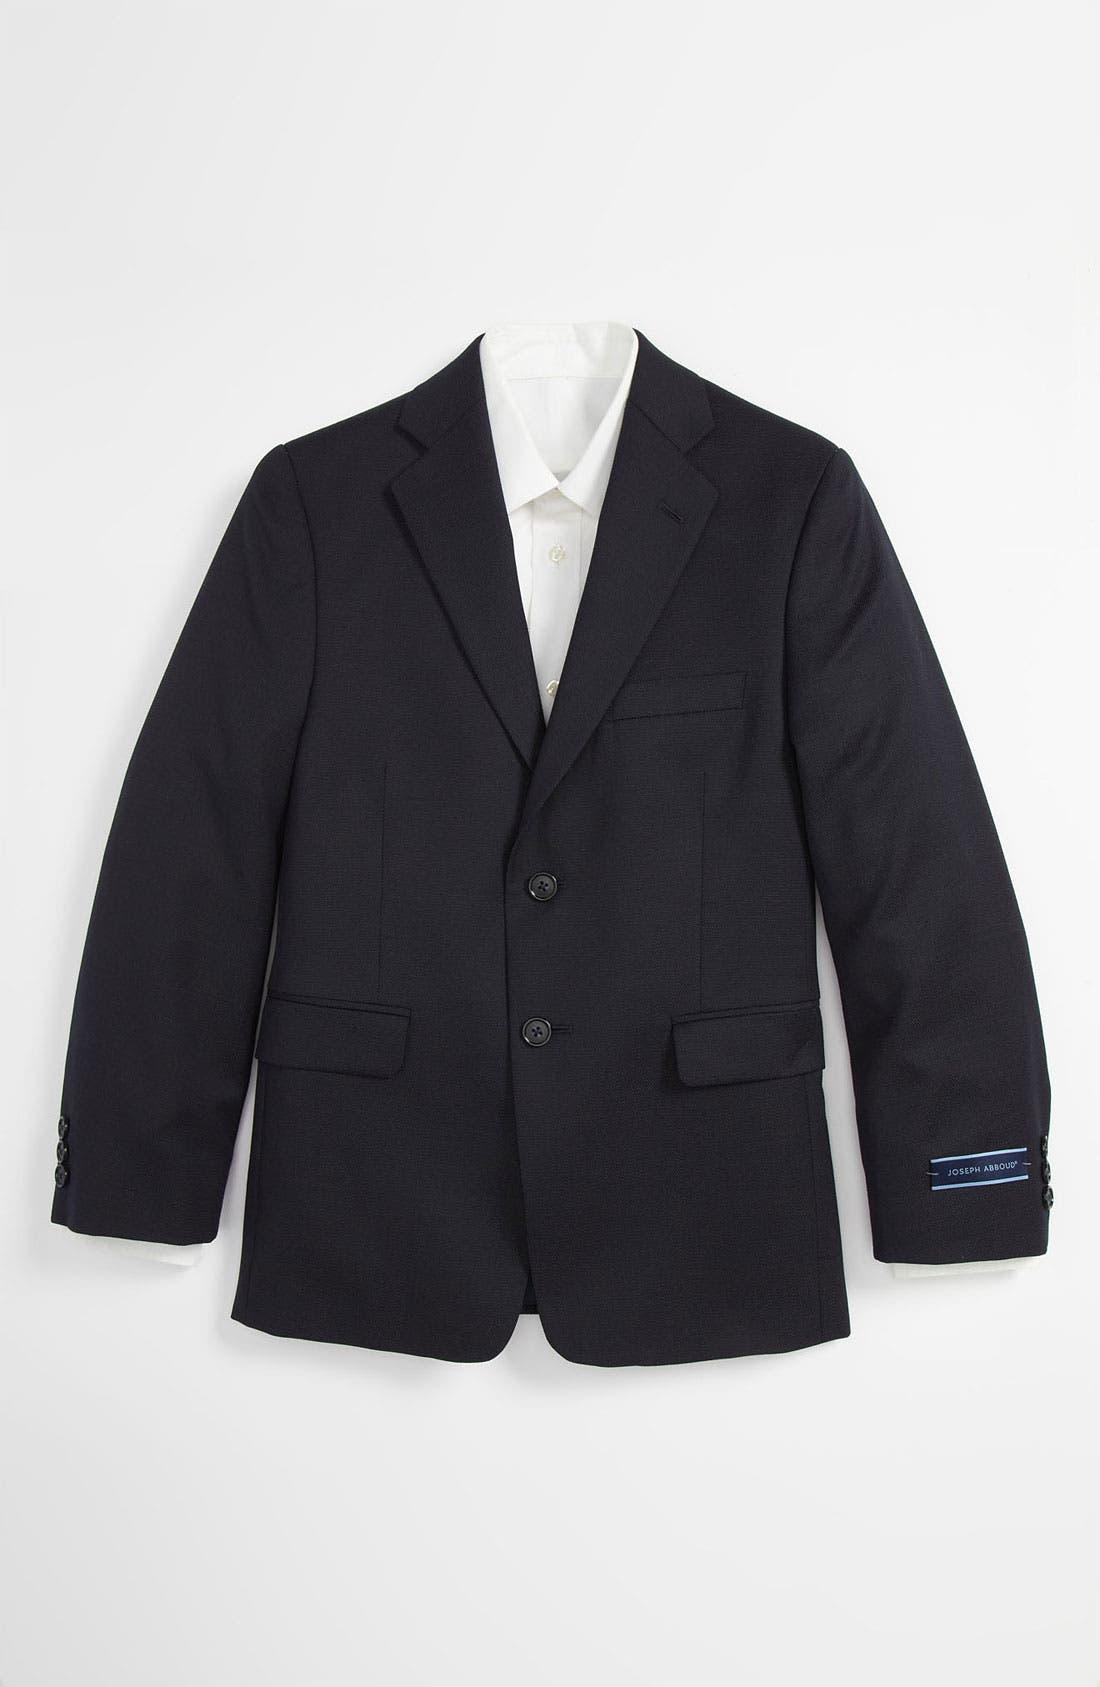 Main Image - Joseph Abboud Suit Blazer (Big Boys)